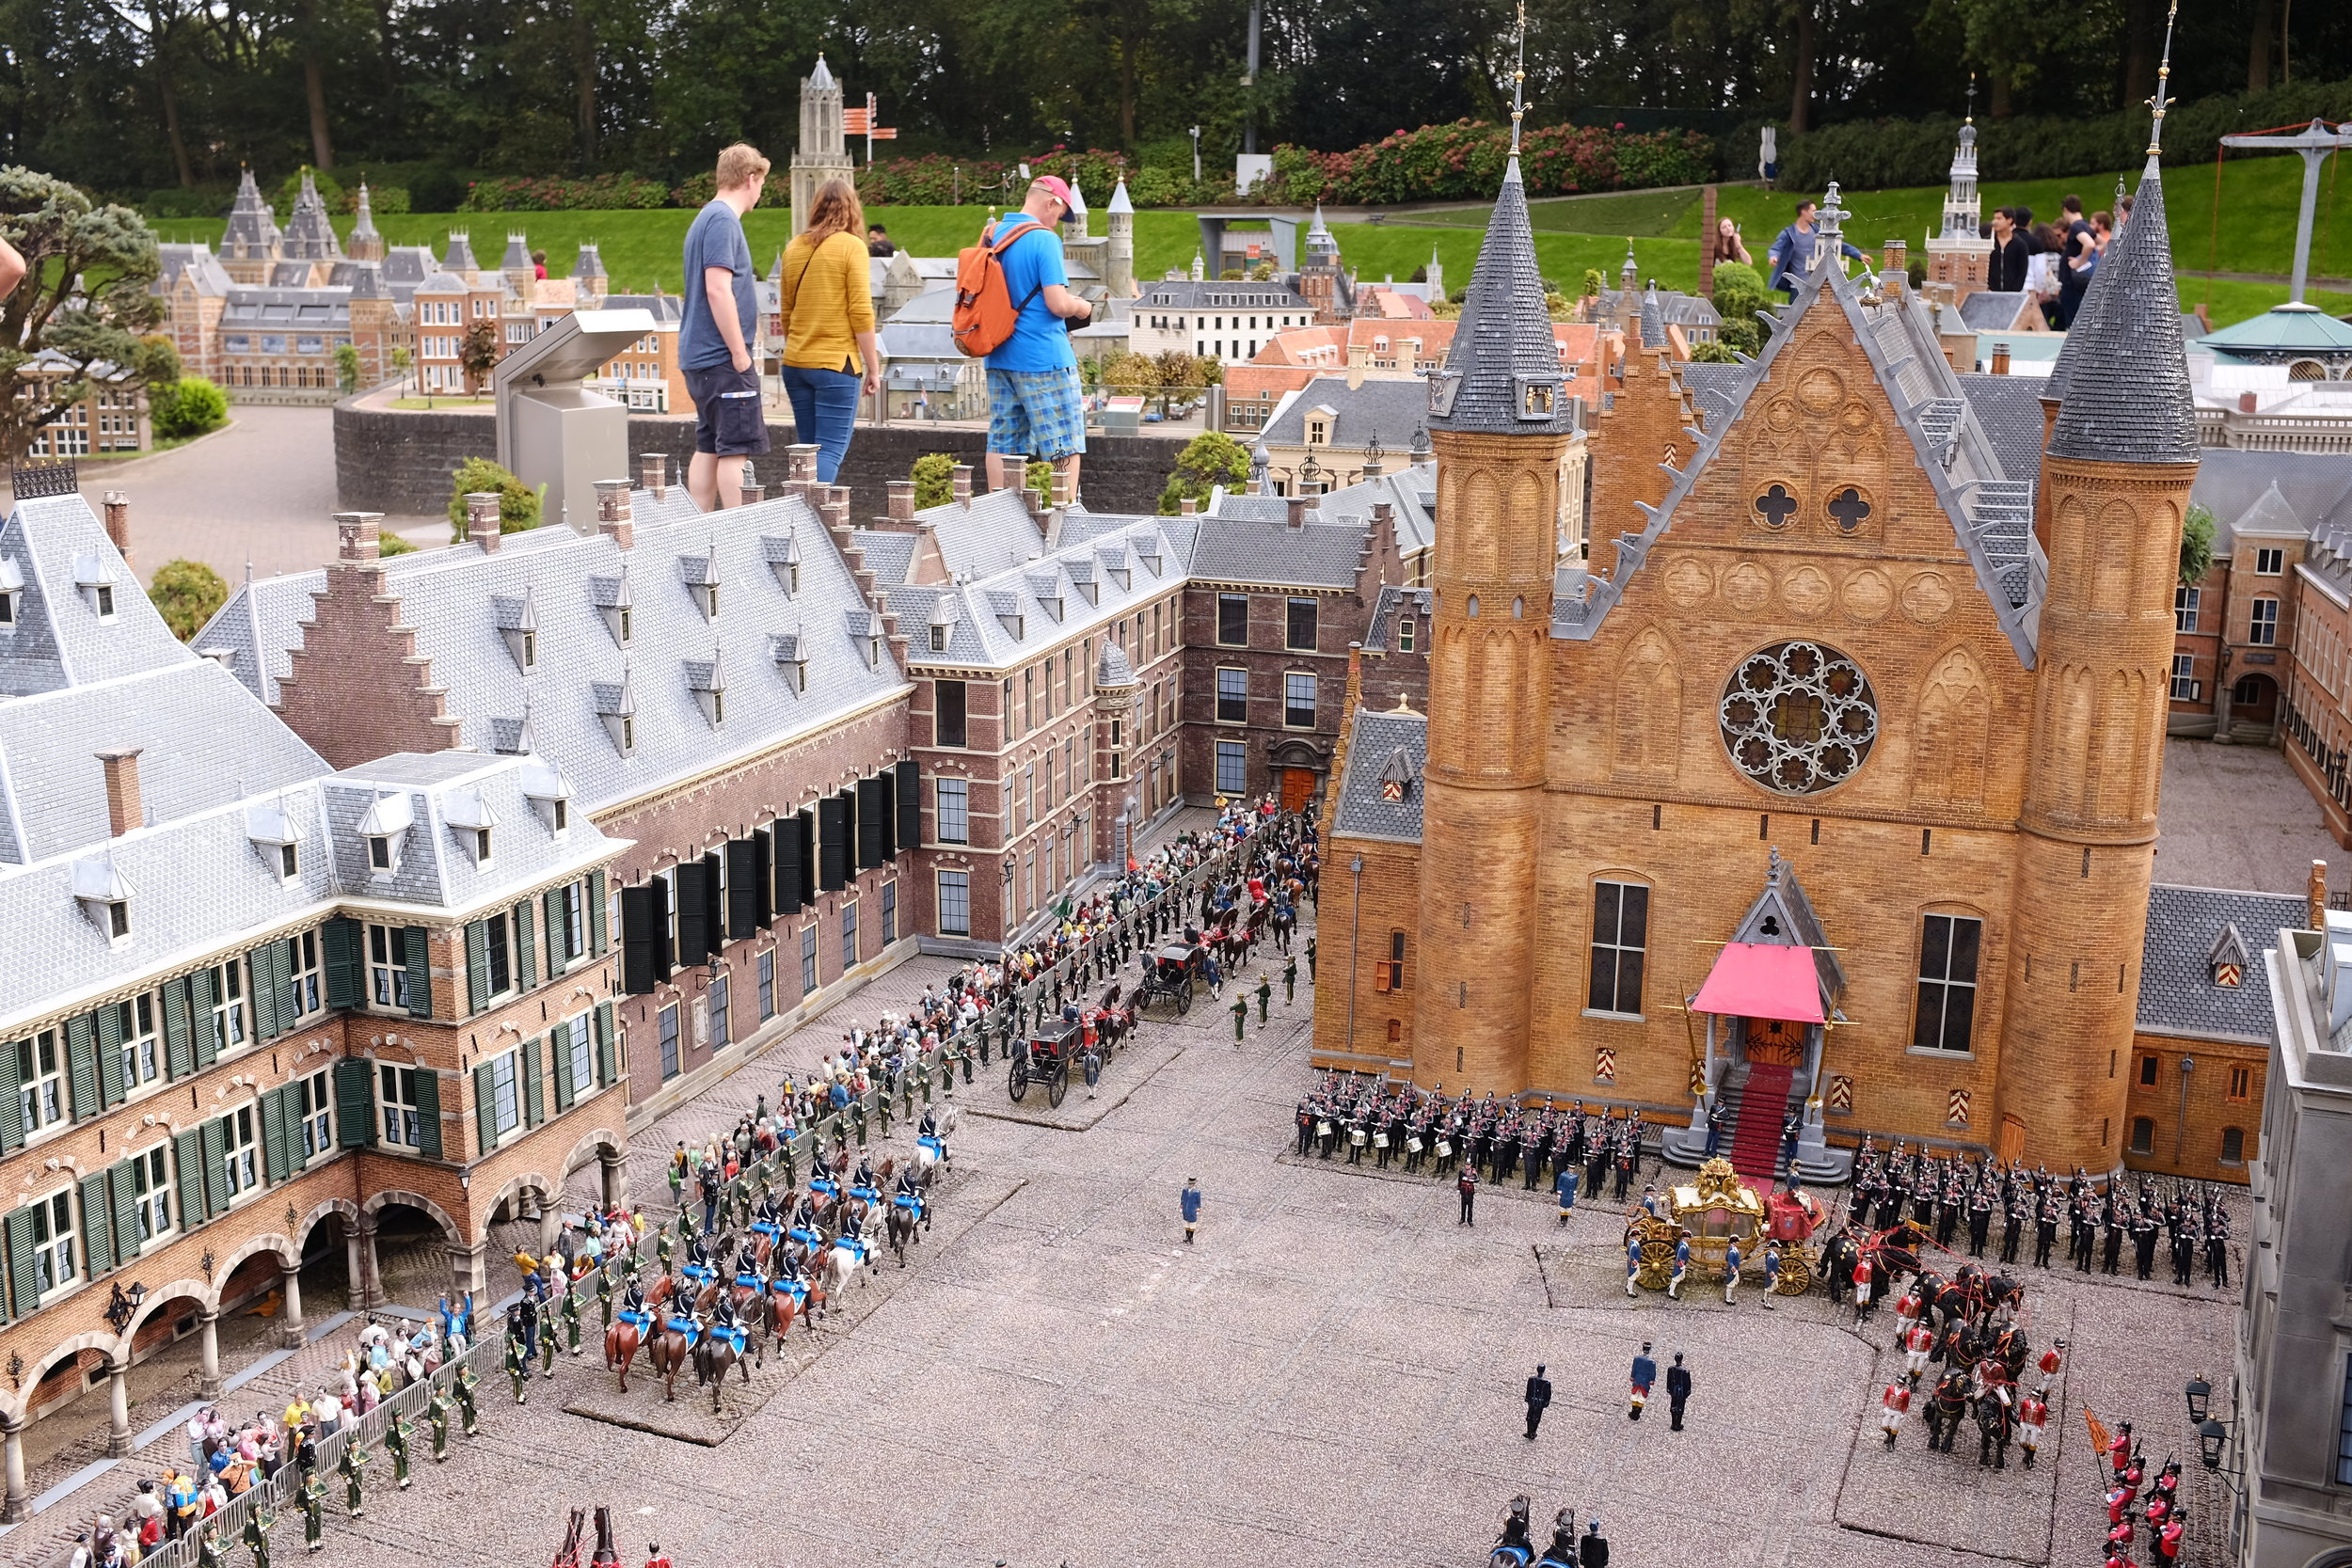 Het Binnenhof The Hague (National Parliament)